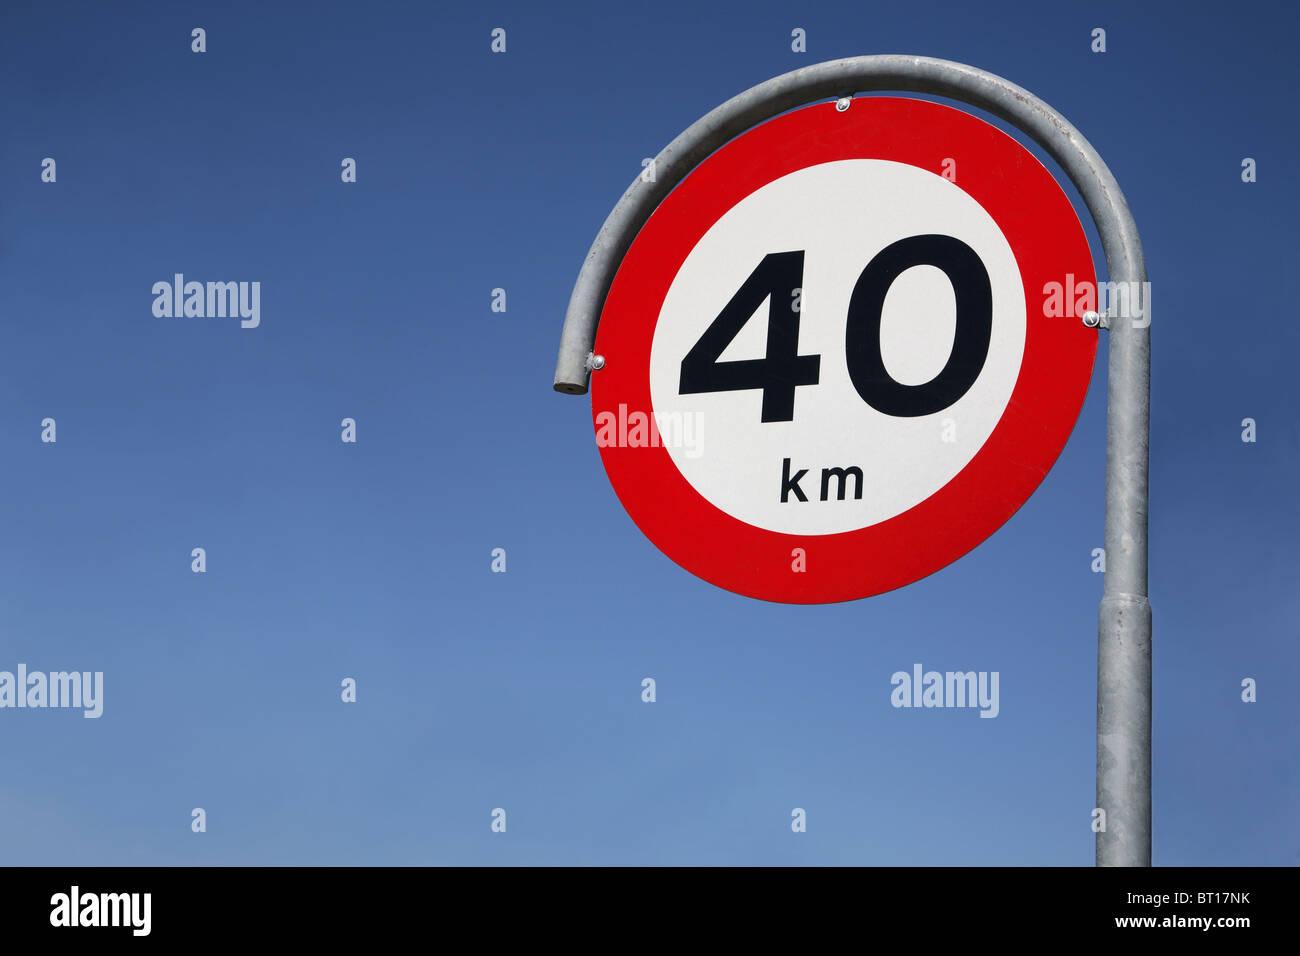 Speed limit 40km traffic sign - Stock Image